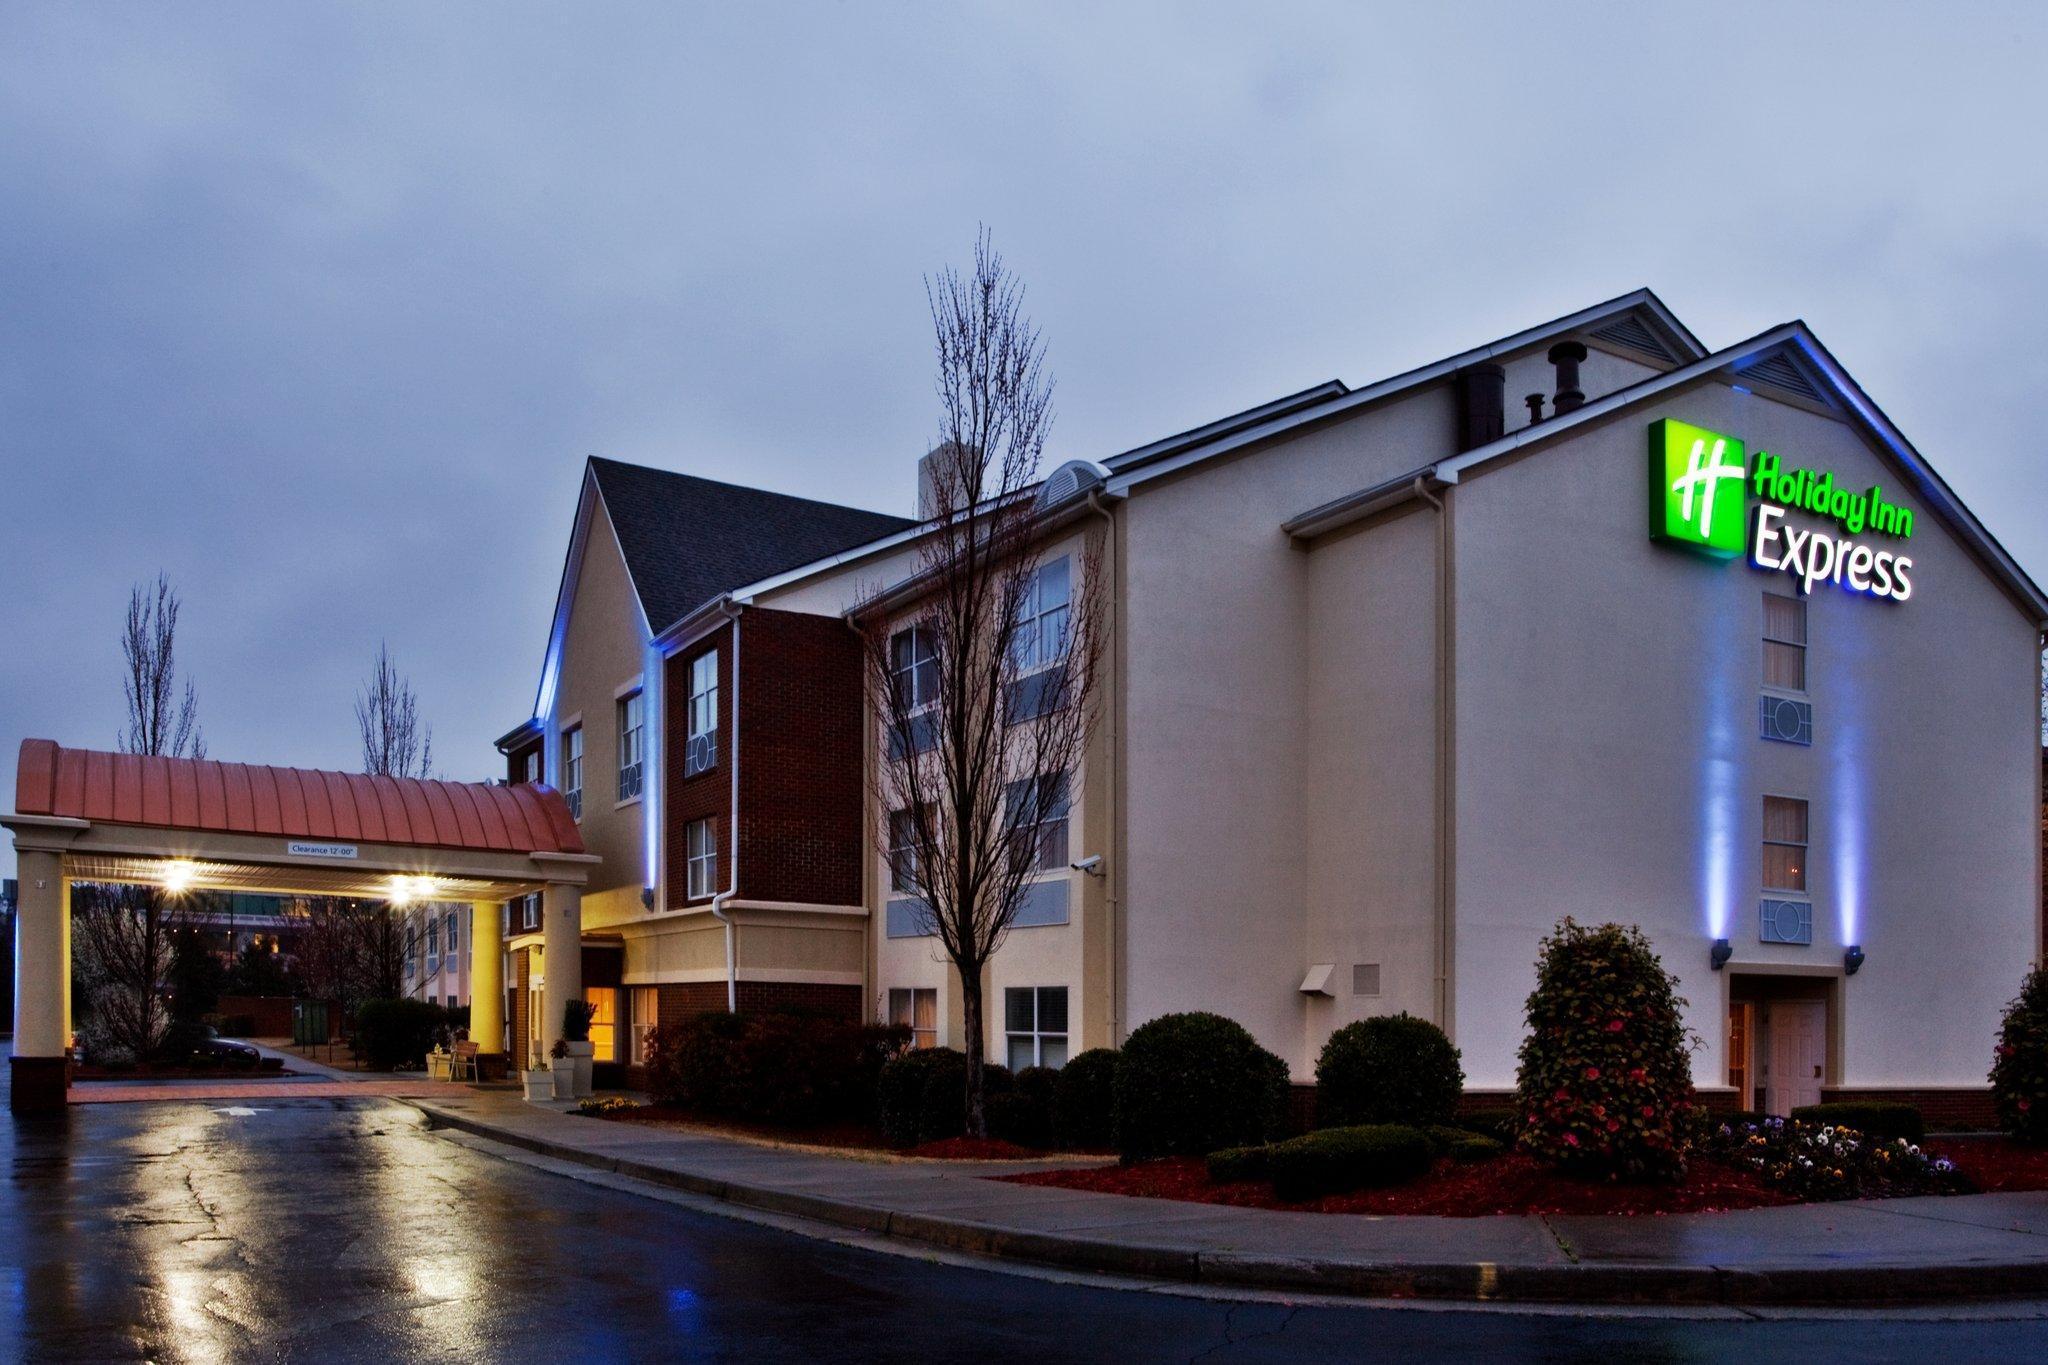 Holiday Inn Express Alpharetta   Roswell